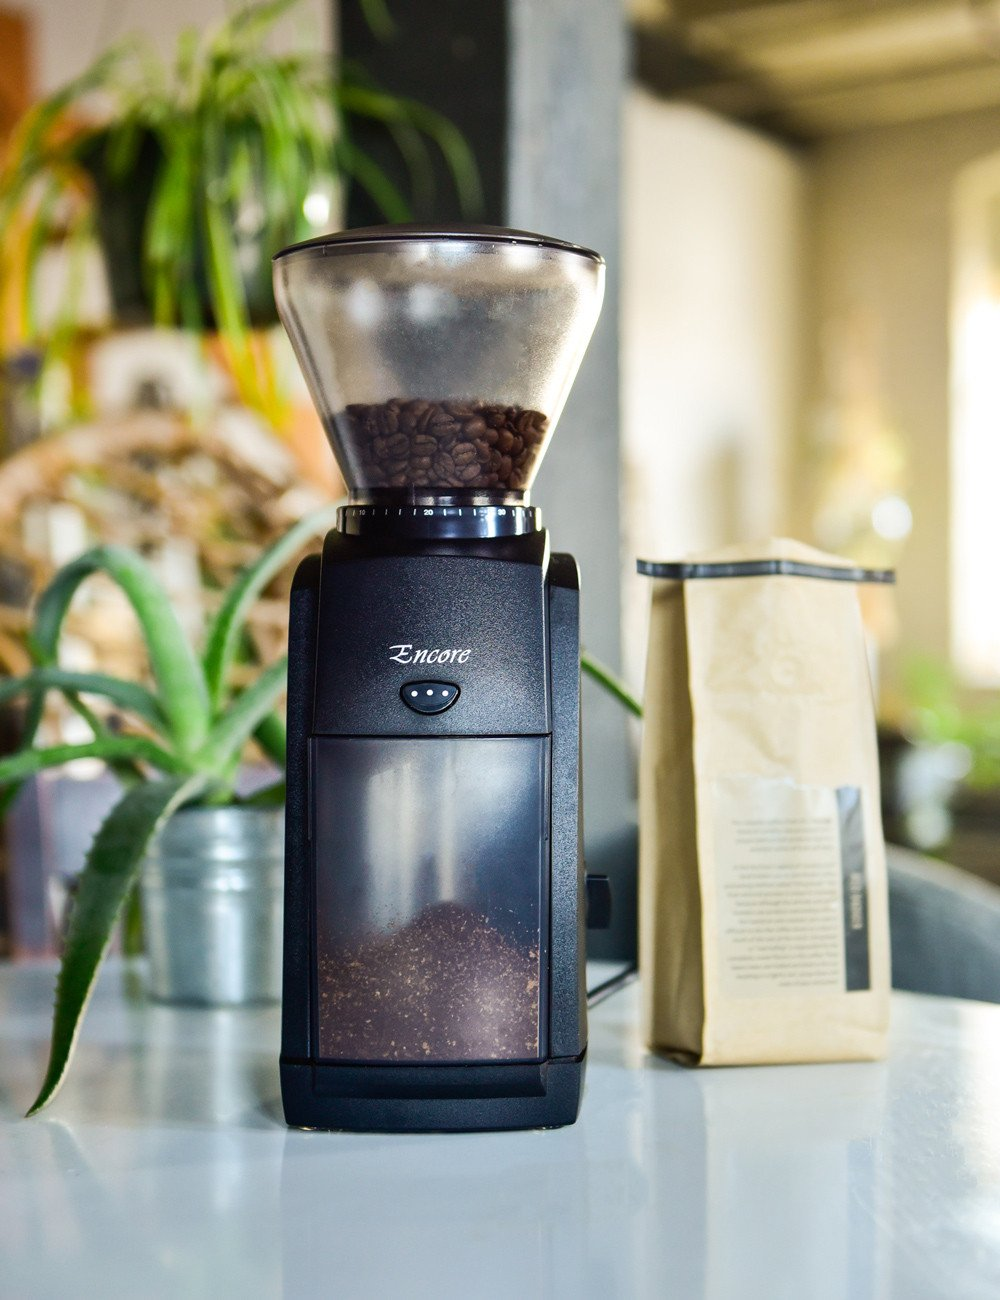 Baratza Encore Electric Grinder – La Colombe Coffee Roasters